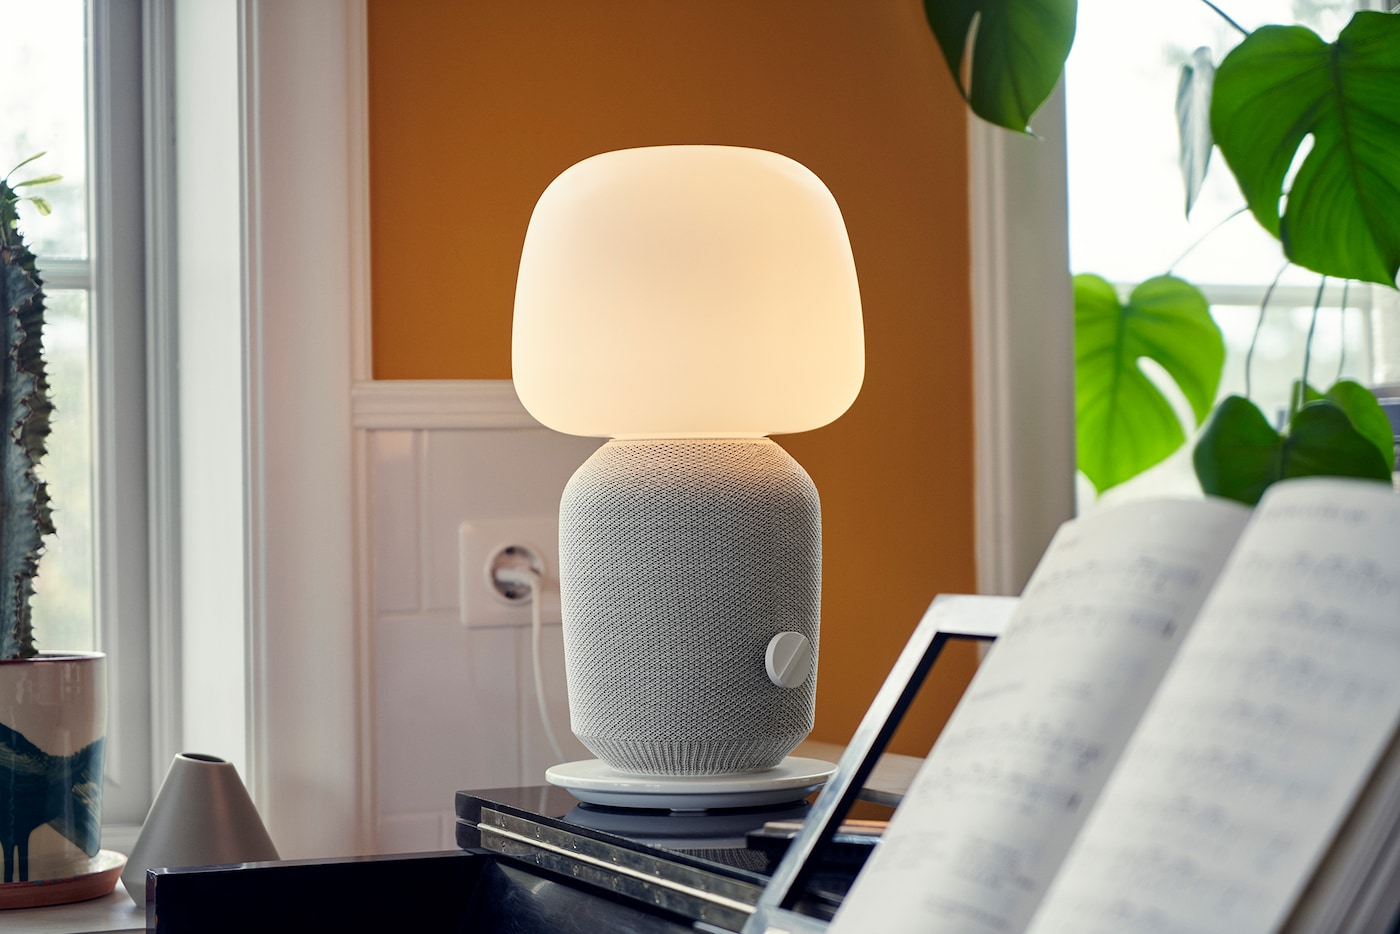 SYMFONISK speaker lamp sonos geluid samenwerking ikea